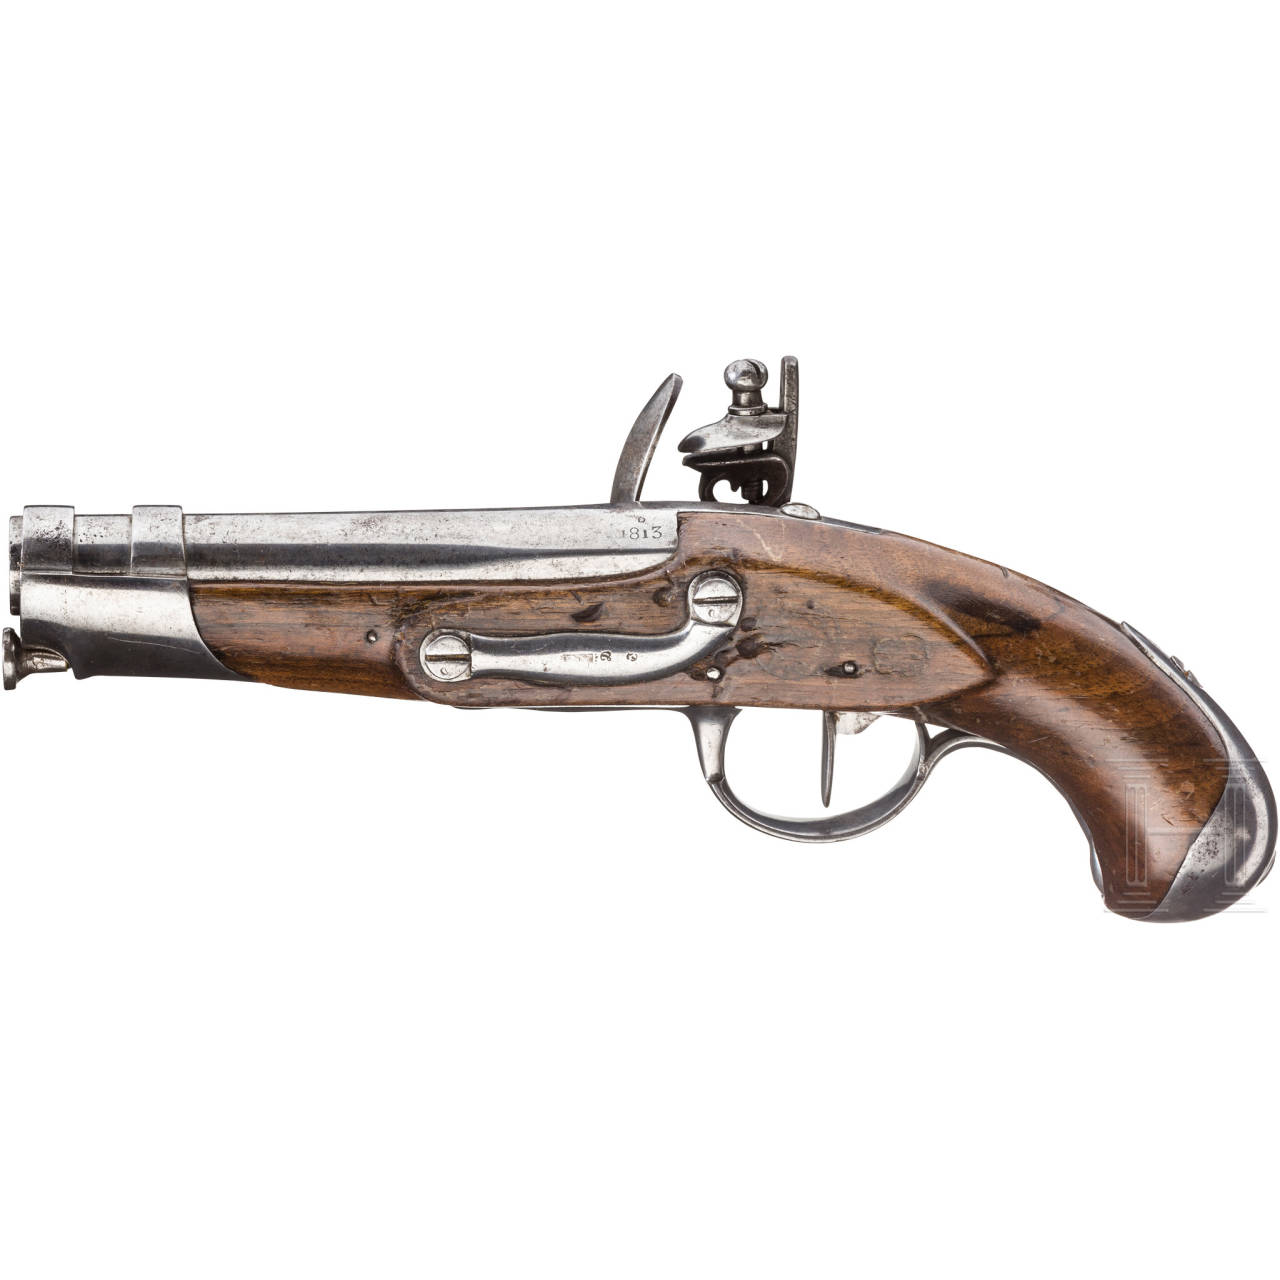 Gendarmeriepistole M An 9, Manufaktur Maubeuge, datiert 1813